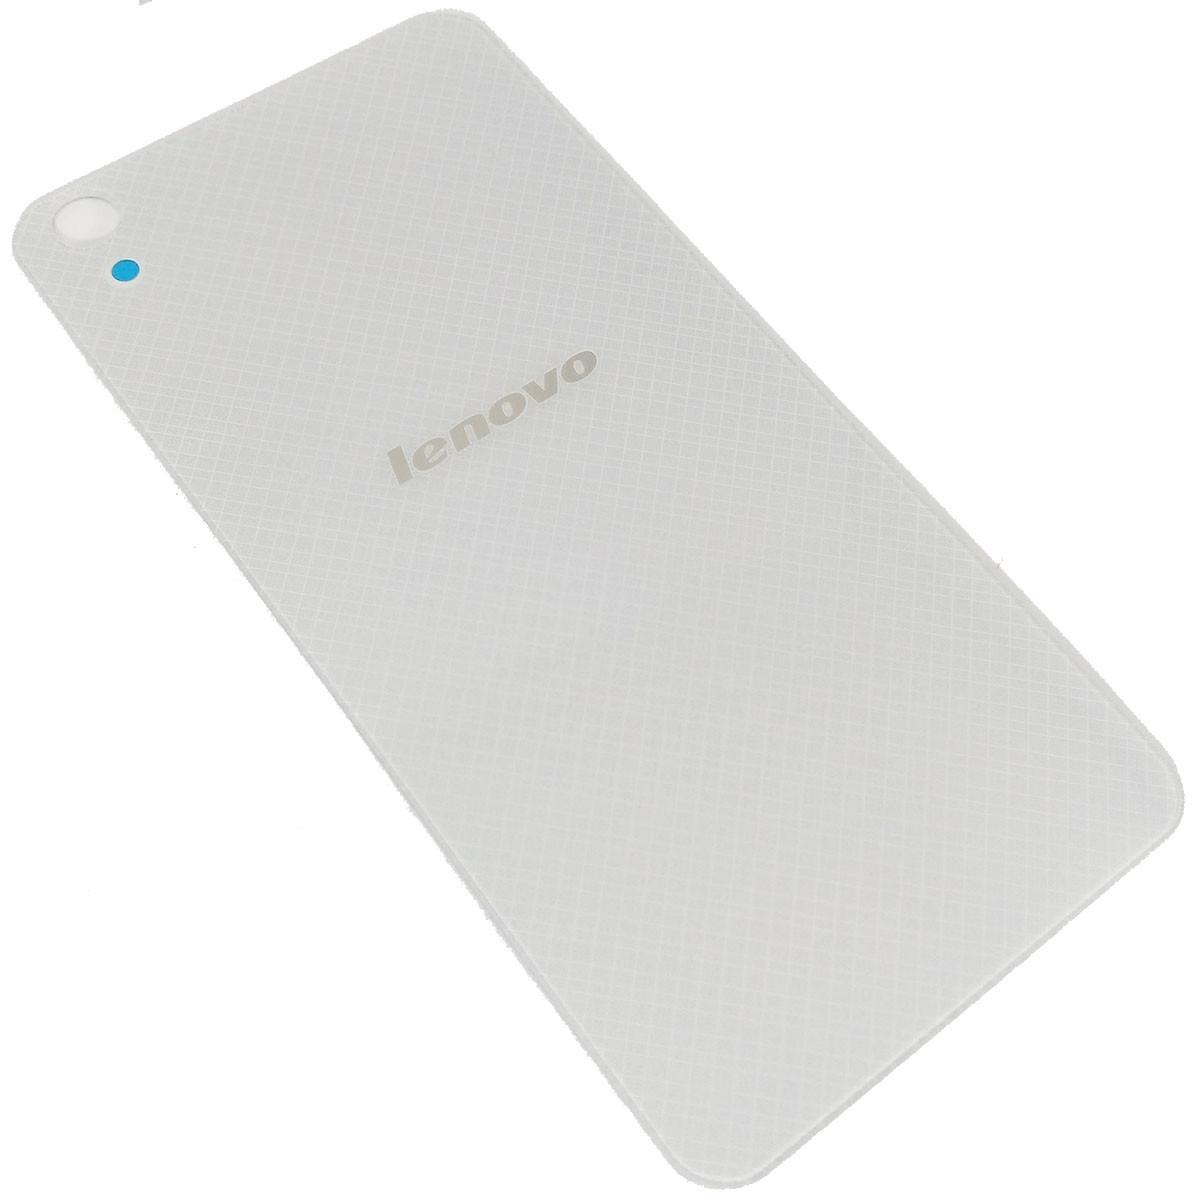 Задняя крышка Lenovo S850 white , сменная панель леново